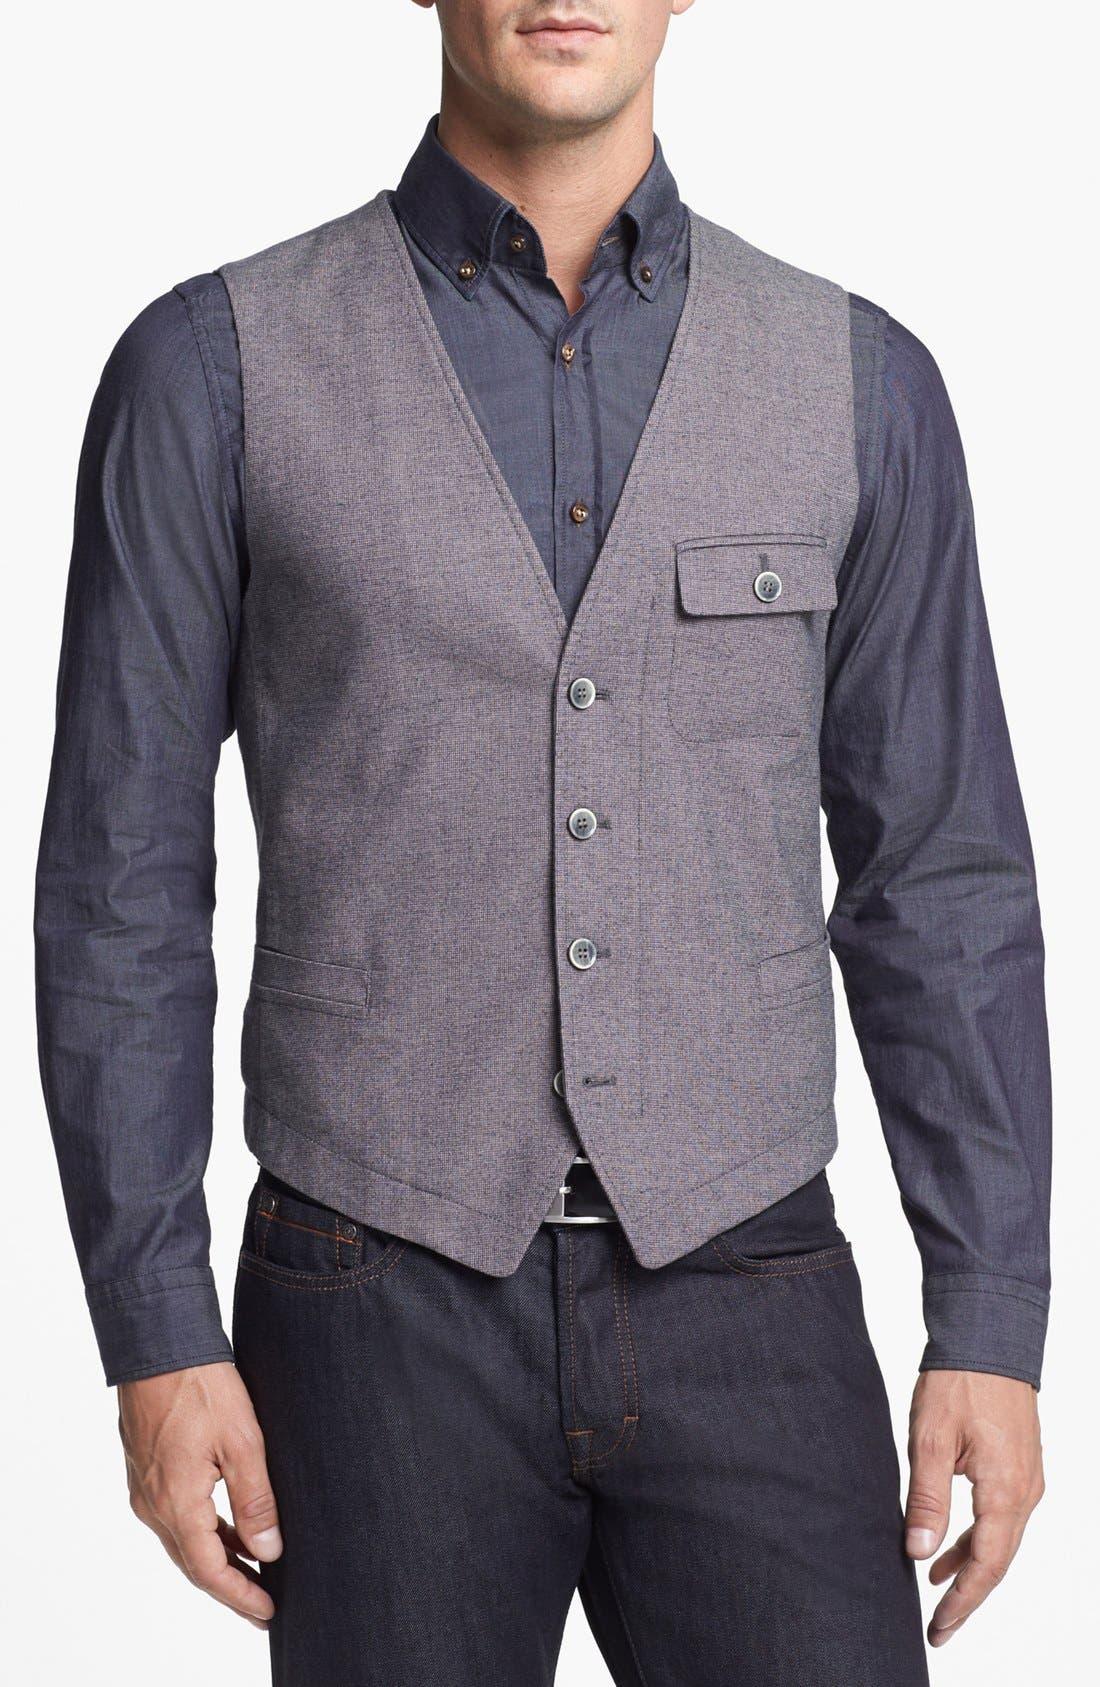 Alternate Image 1 Selected - BOSS HUGO BOSS 'Cinor' Vest